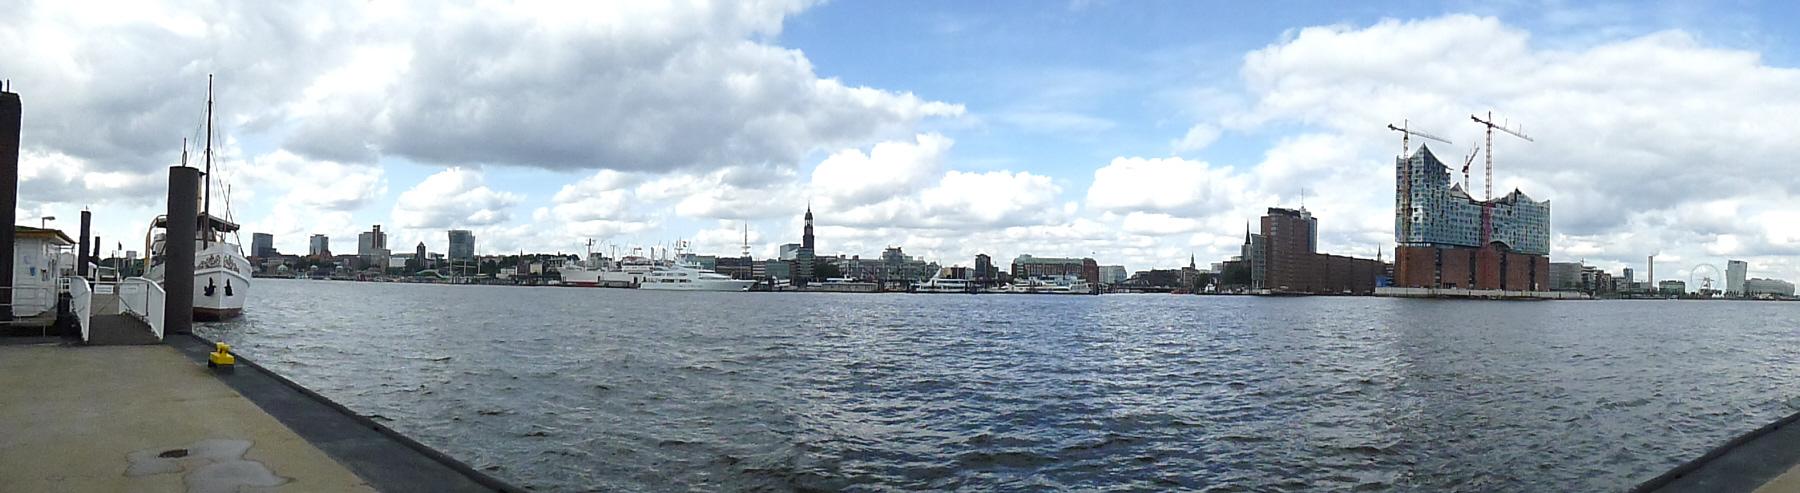 Rundblick auf Hamburg